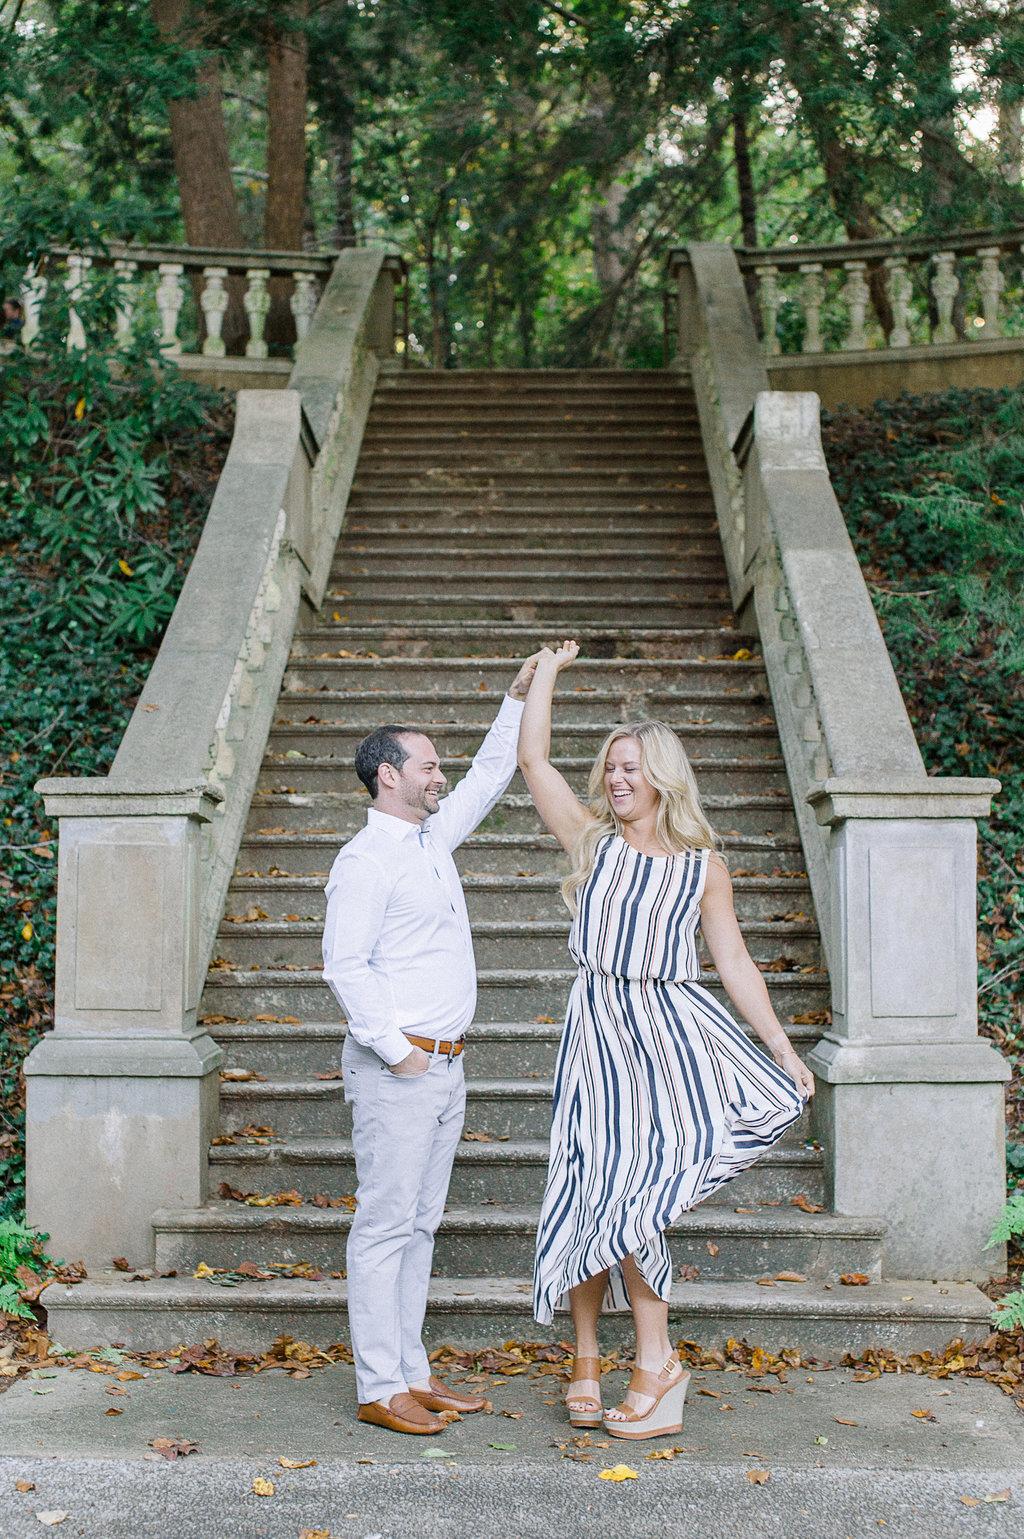 Cator-Woolford-Gardens-Engagement-atlanta-wedding-photographer-hannah-forsberg-4.jpg